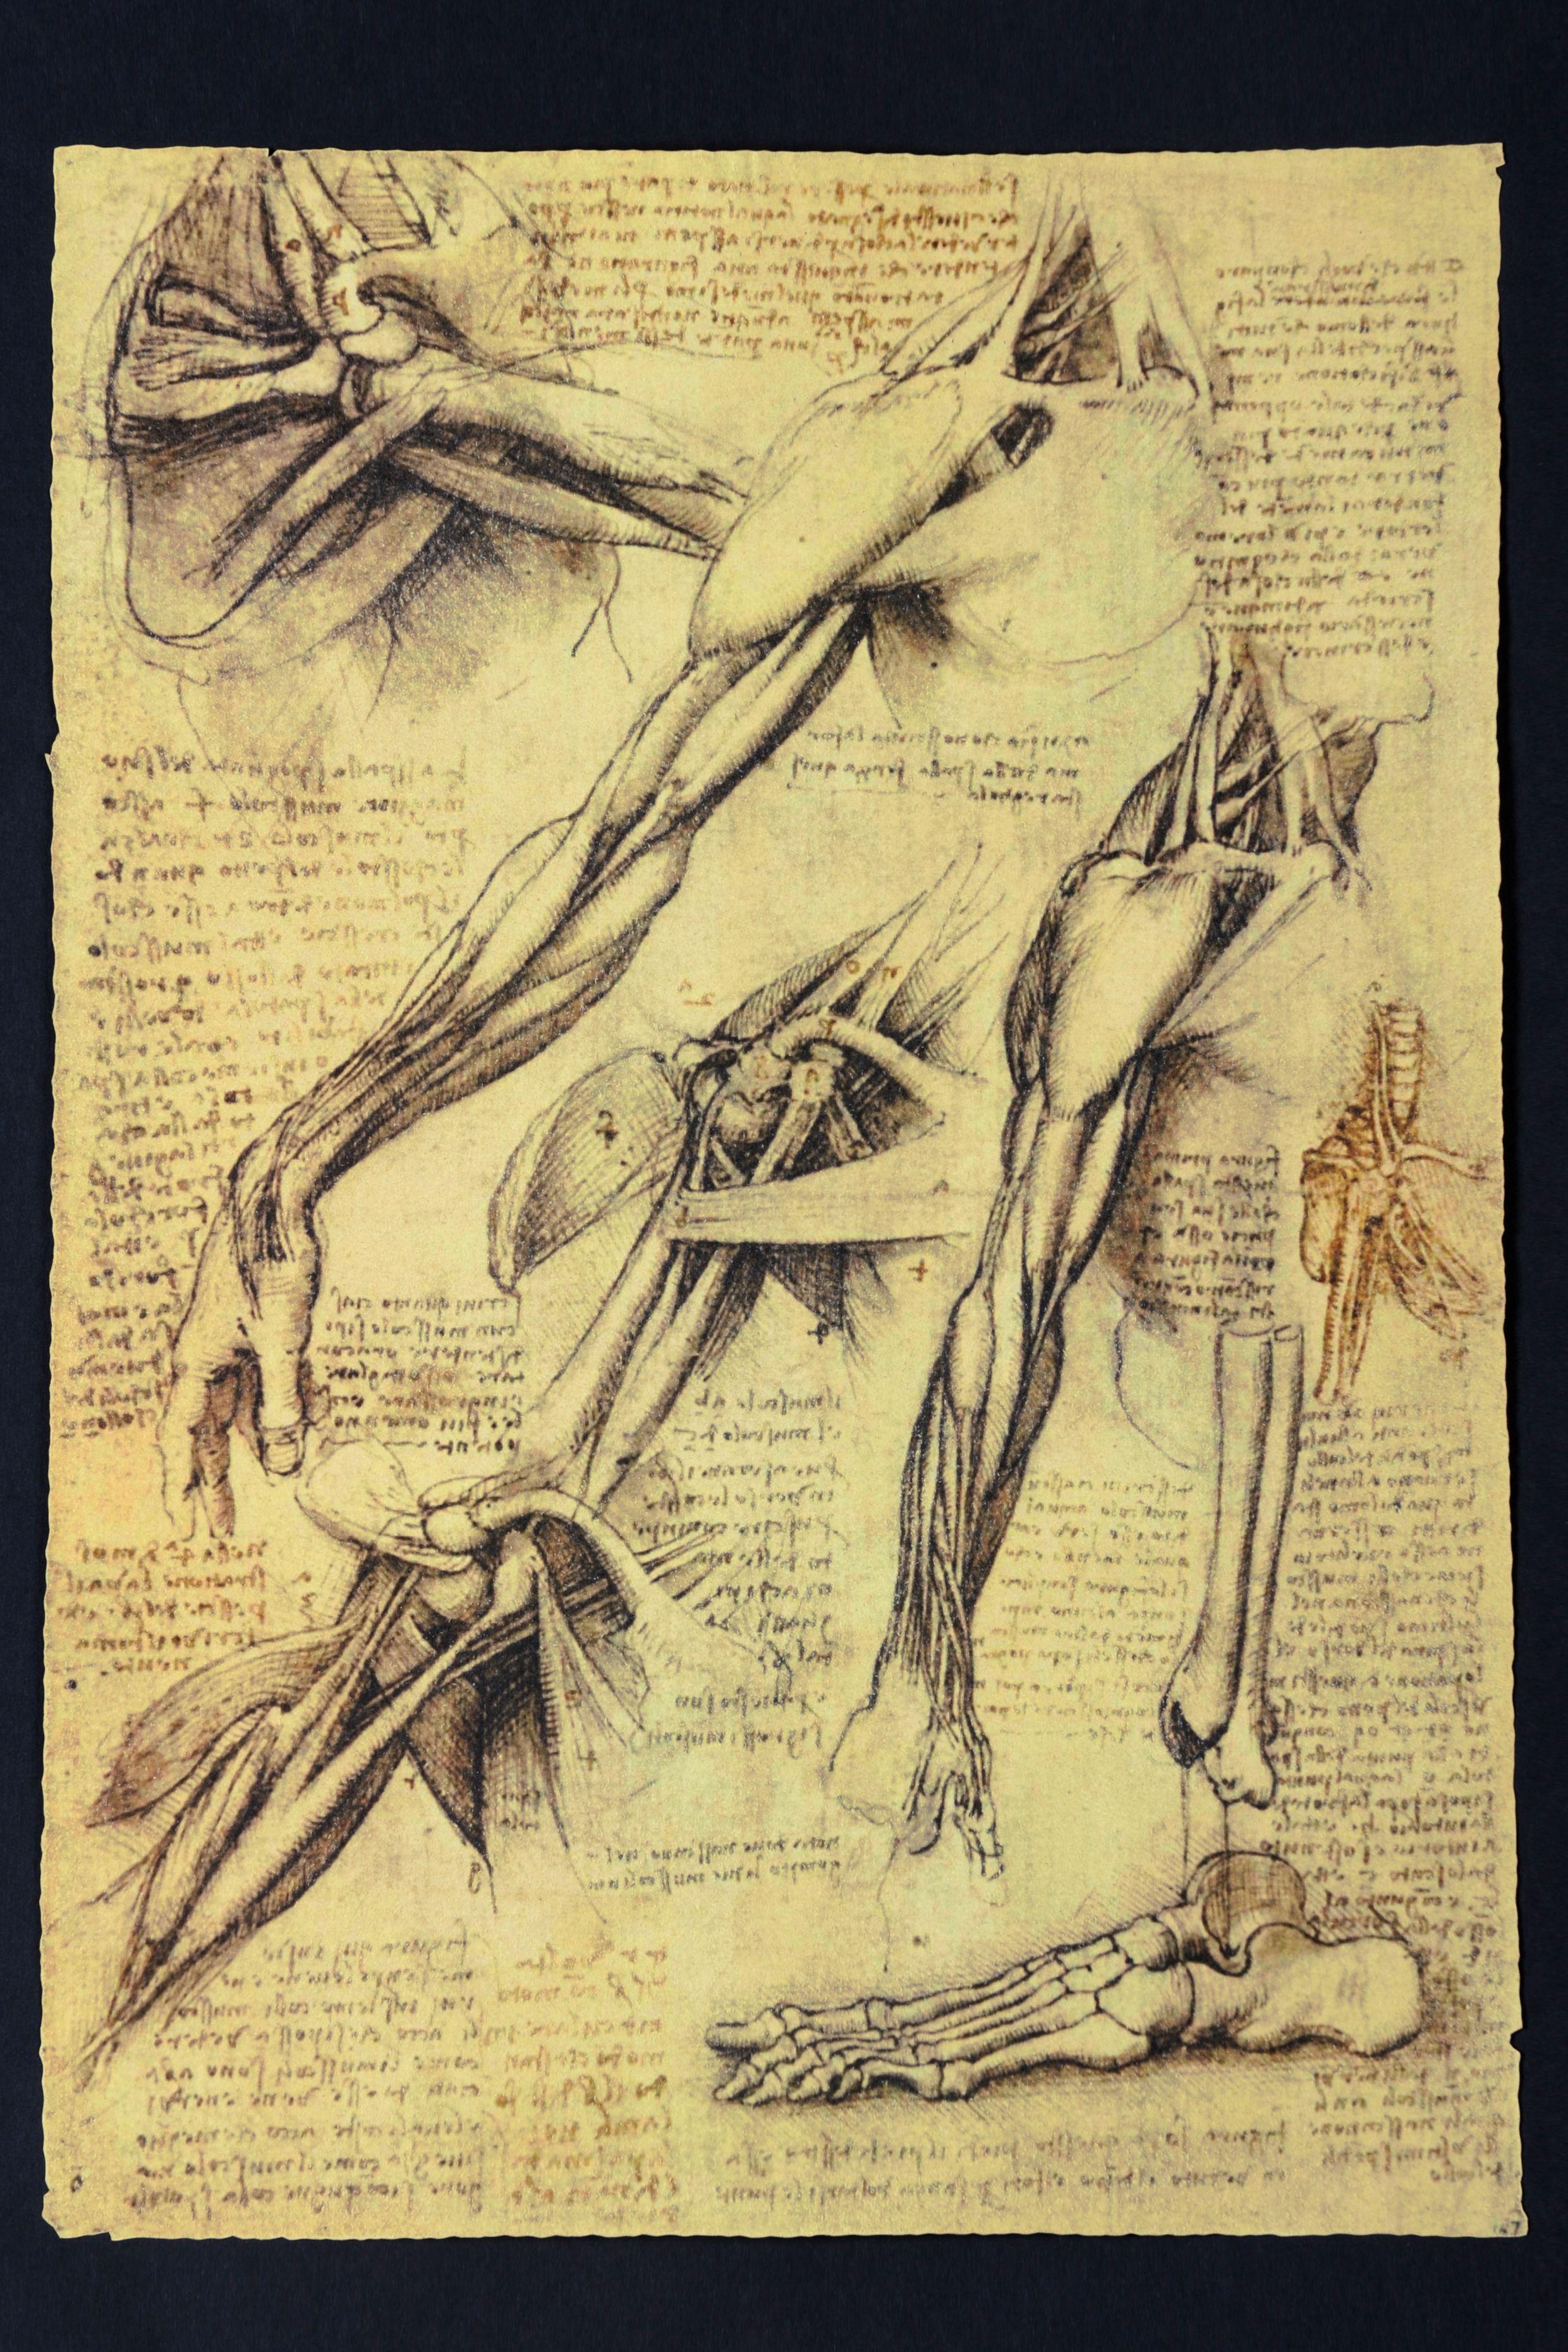 Leonardo da Vinci, Braccia | DRAWINGS | Pinterest